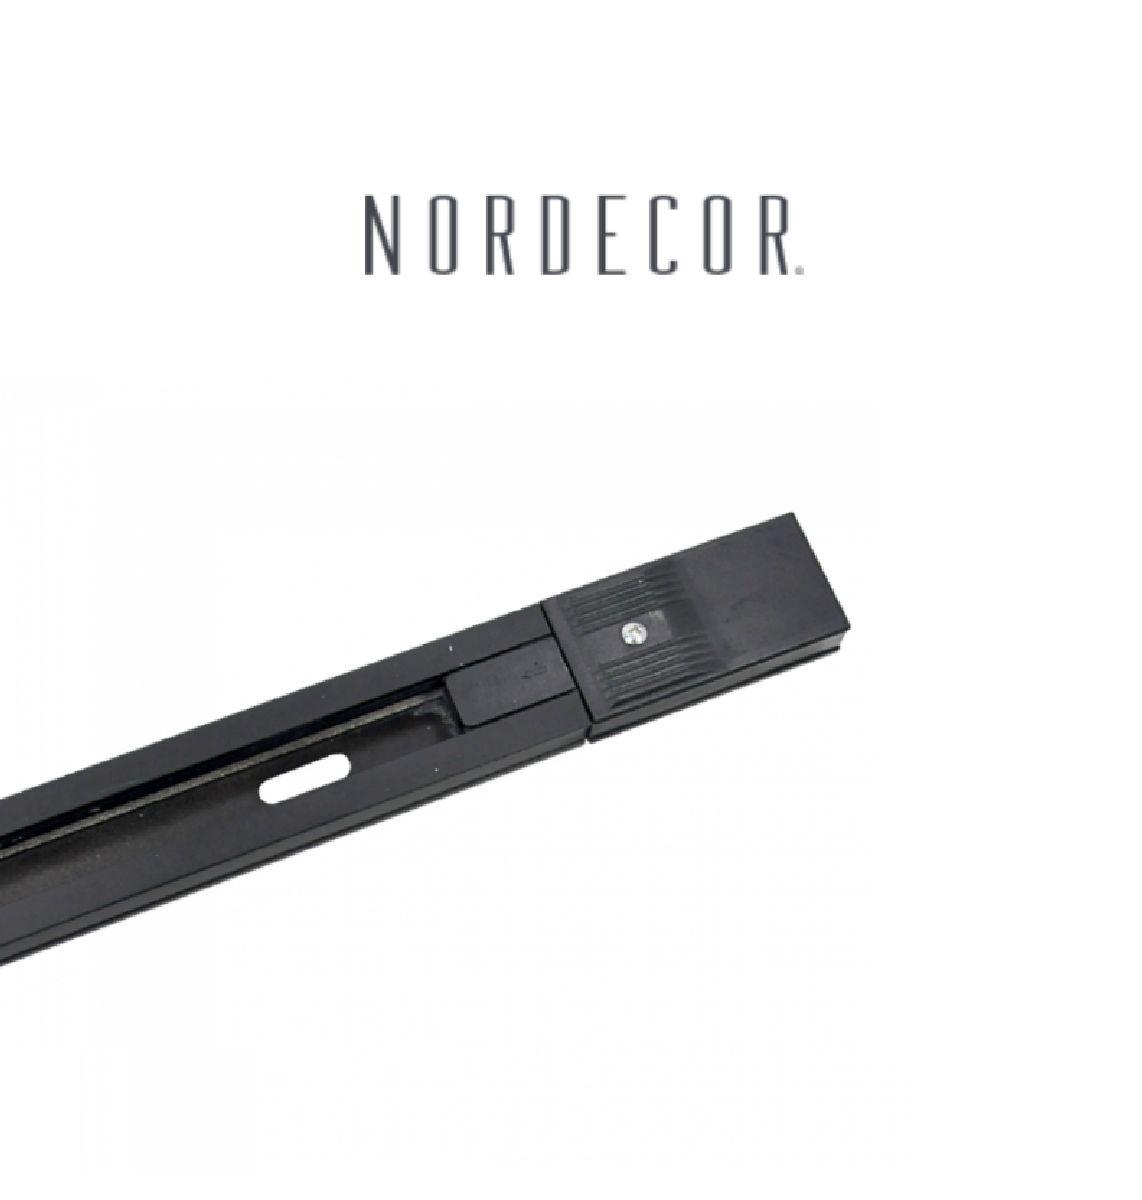 Trilho Eletrificado 2m Preto Para Spots Eletrificado Nordecor 6057